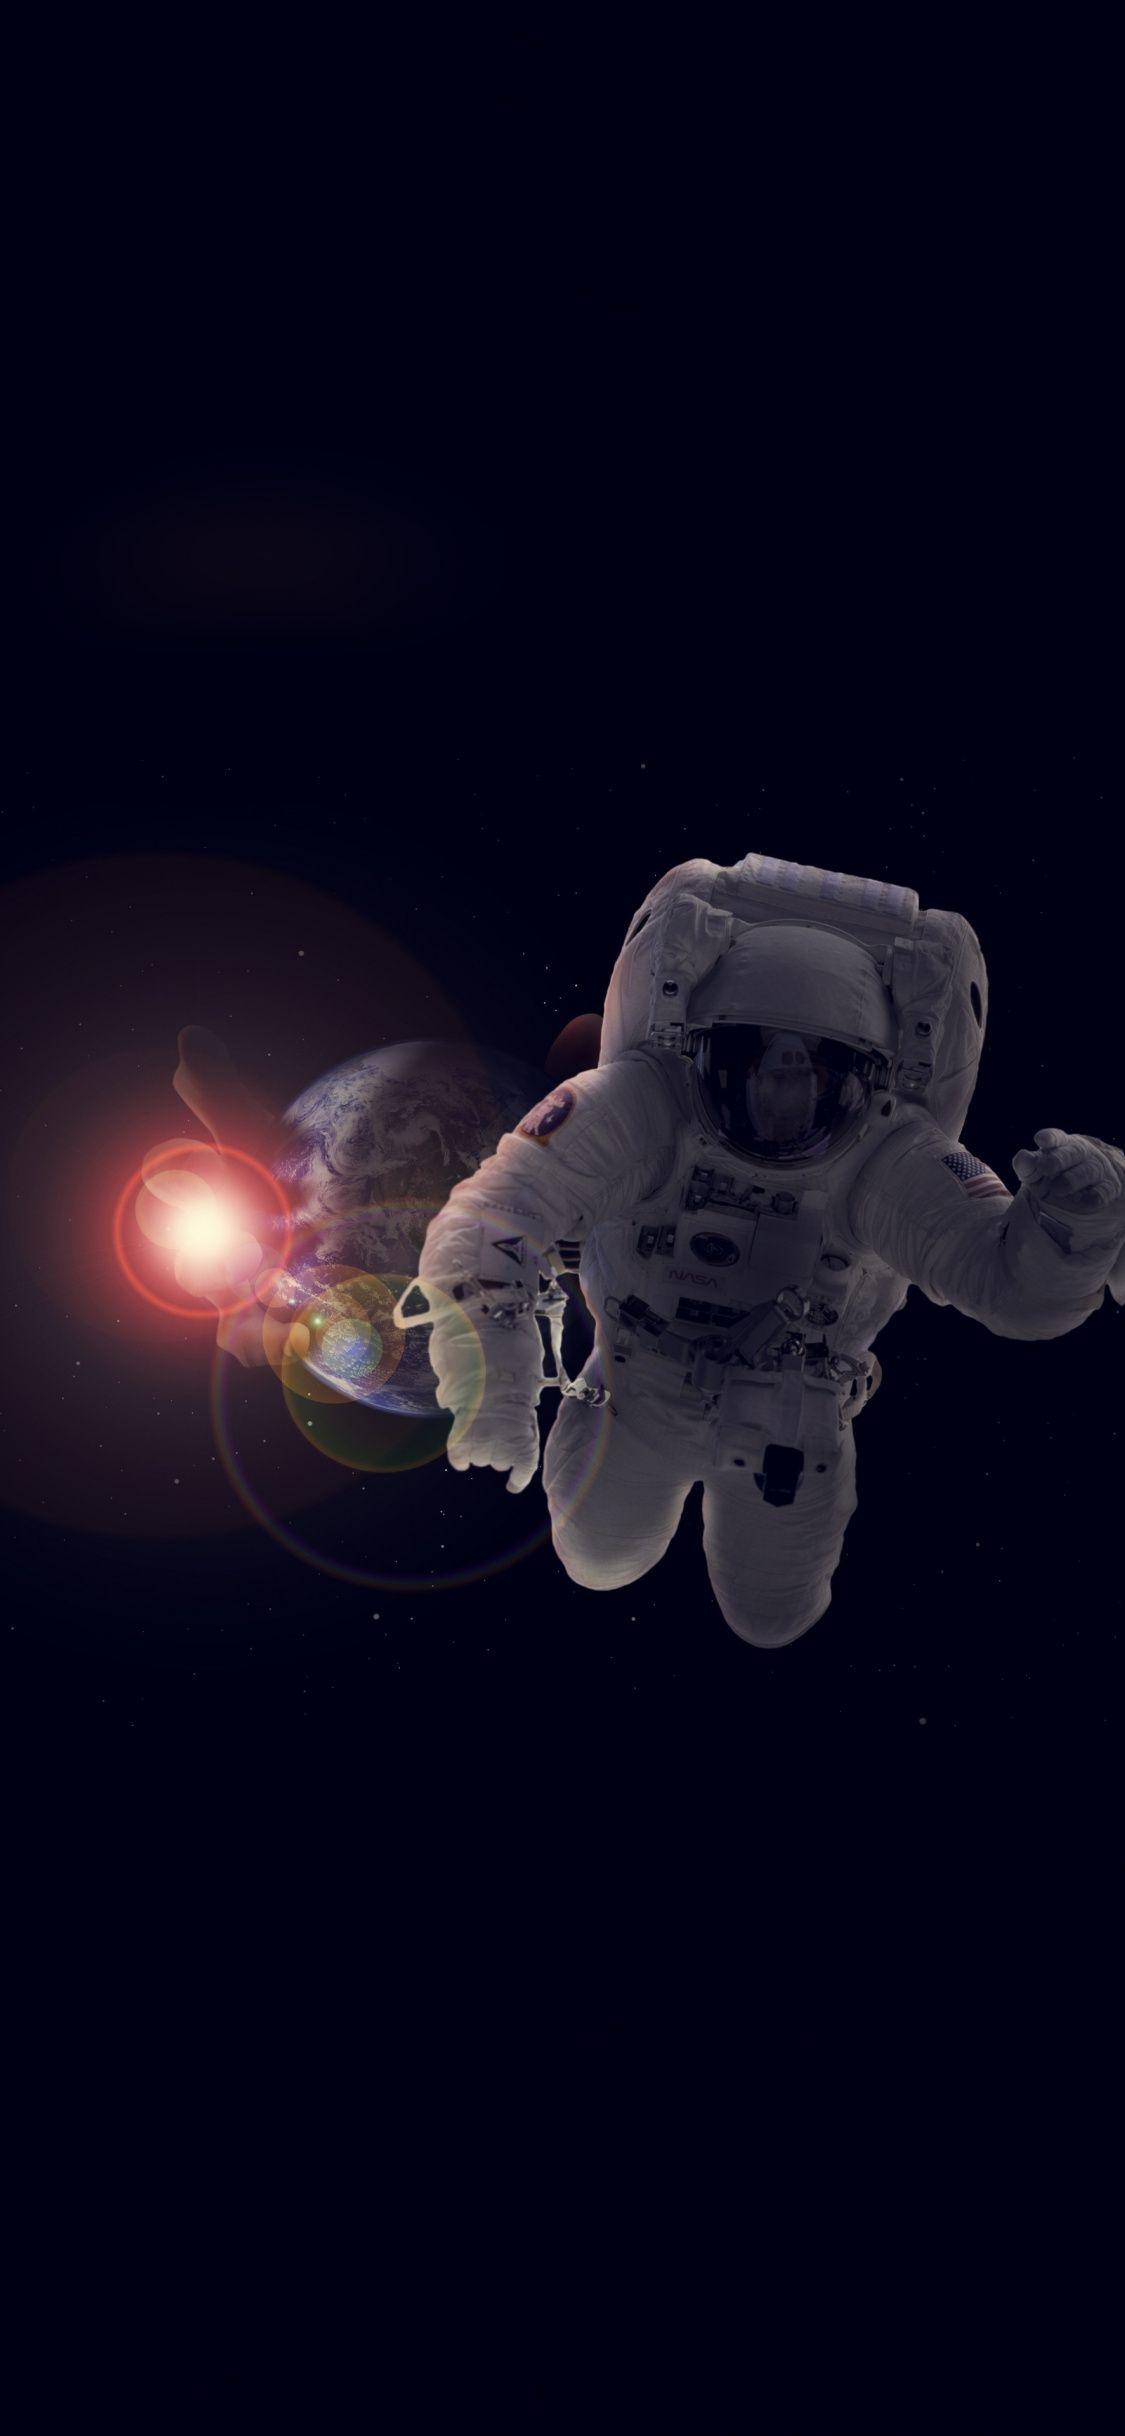 Astronaut Dark Deep Space Earth 1125x2436 Wallpaper Anime Wallpaper Iphone Anime Wallpaper Wallpaper